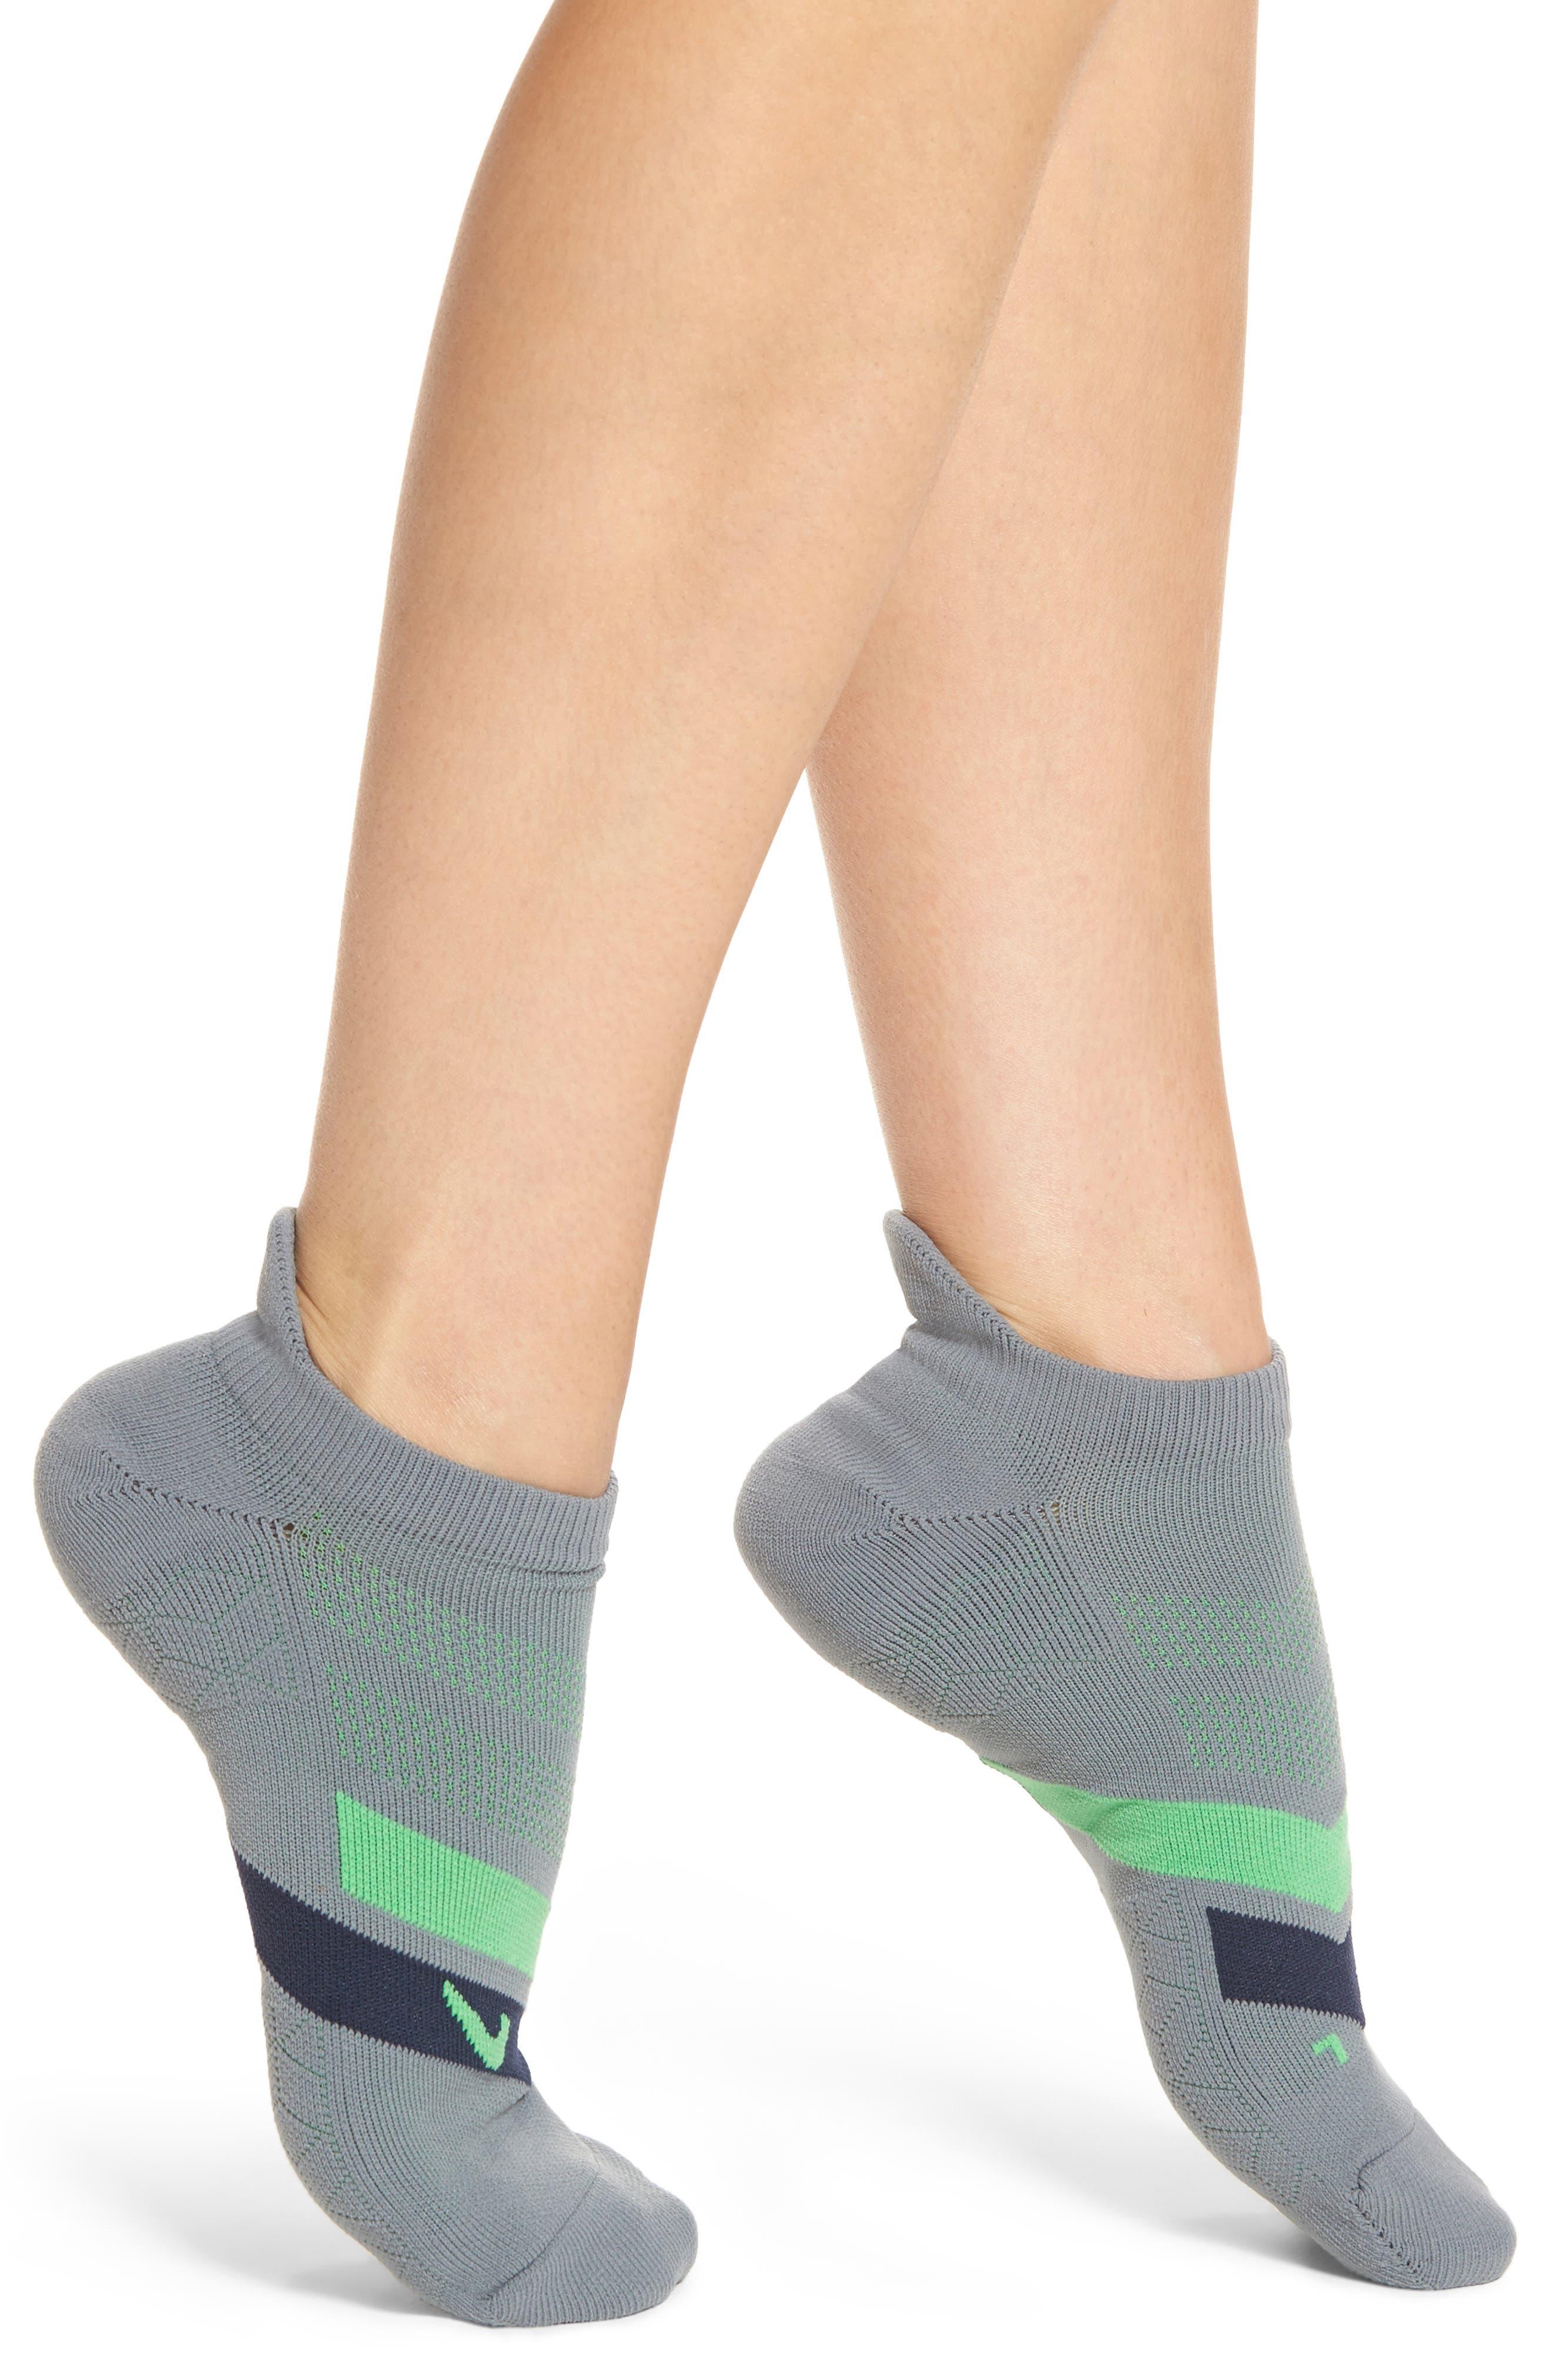 No-Show Running Socks,                         Main,                         color, Grey/ Obsidian/ Green Spark